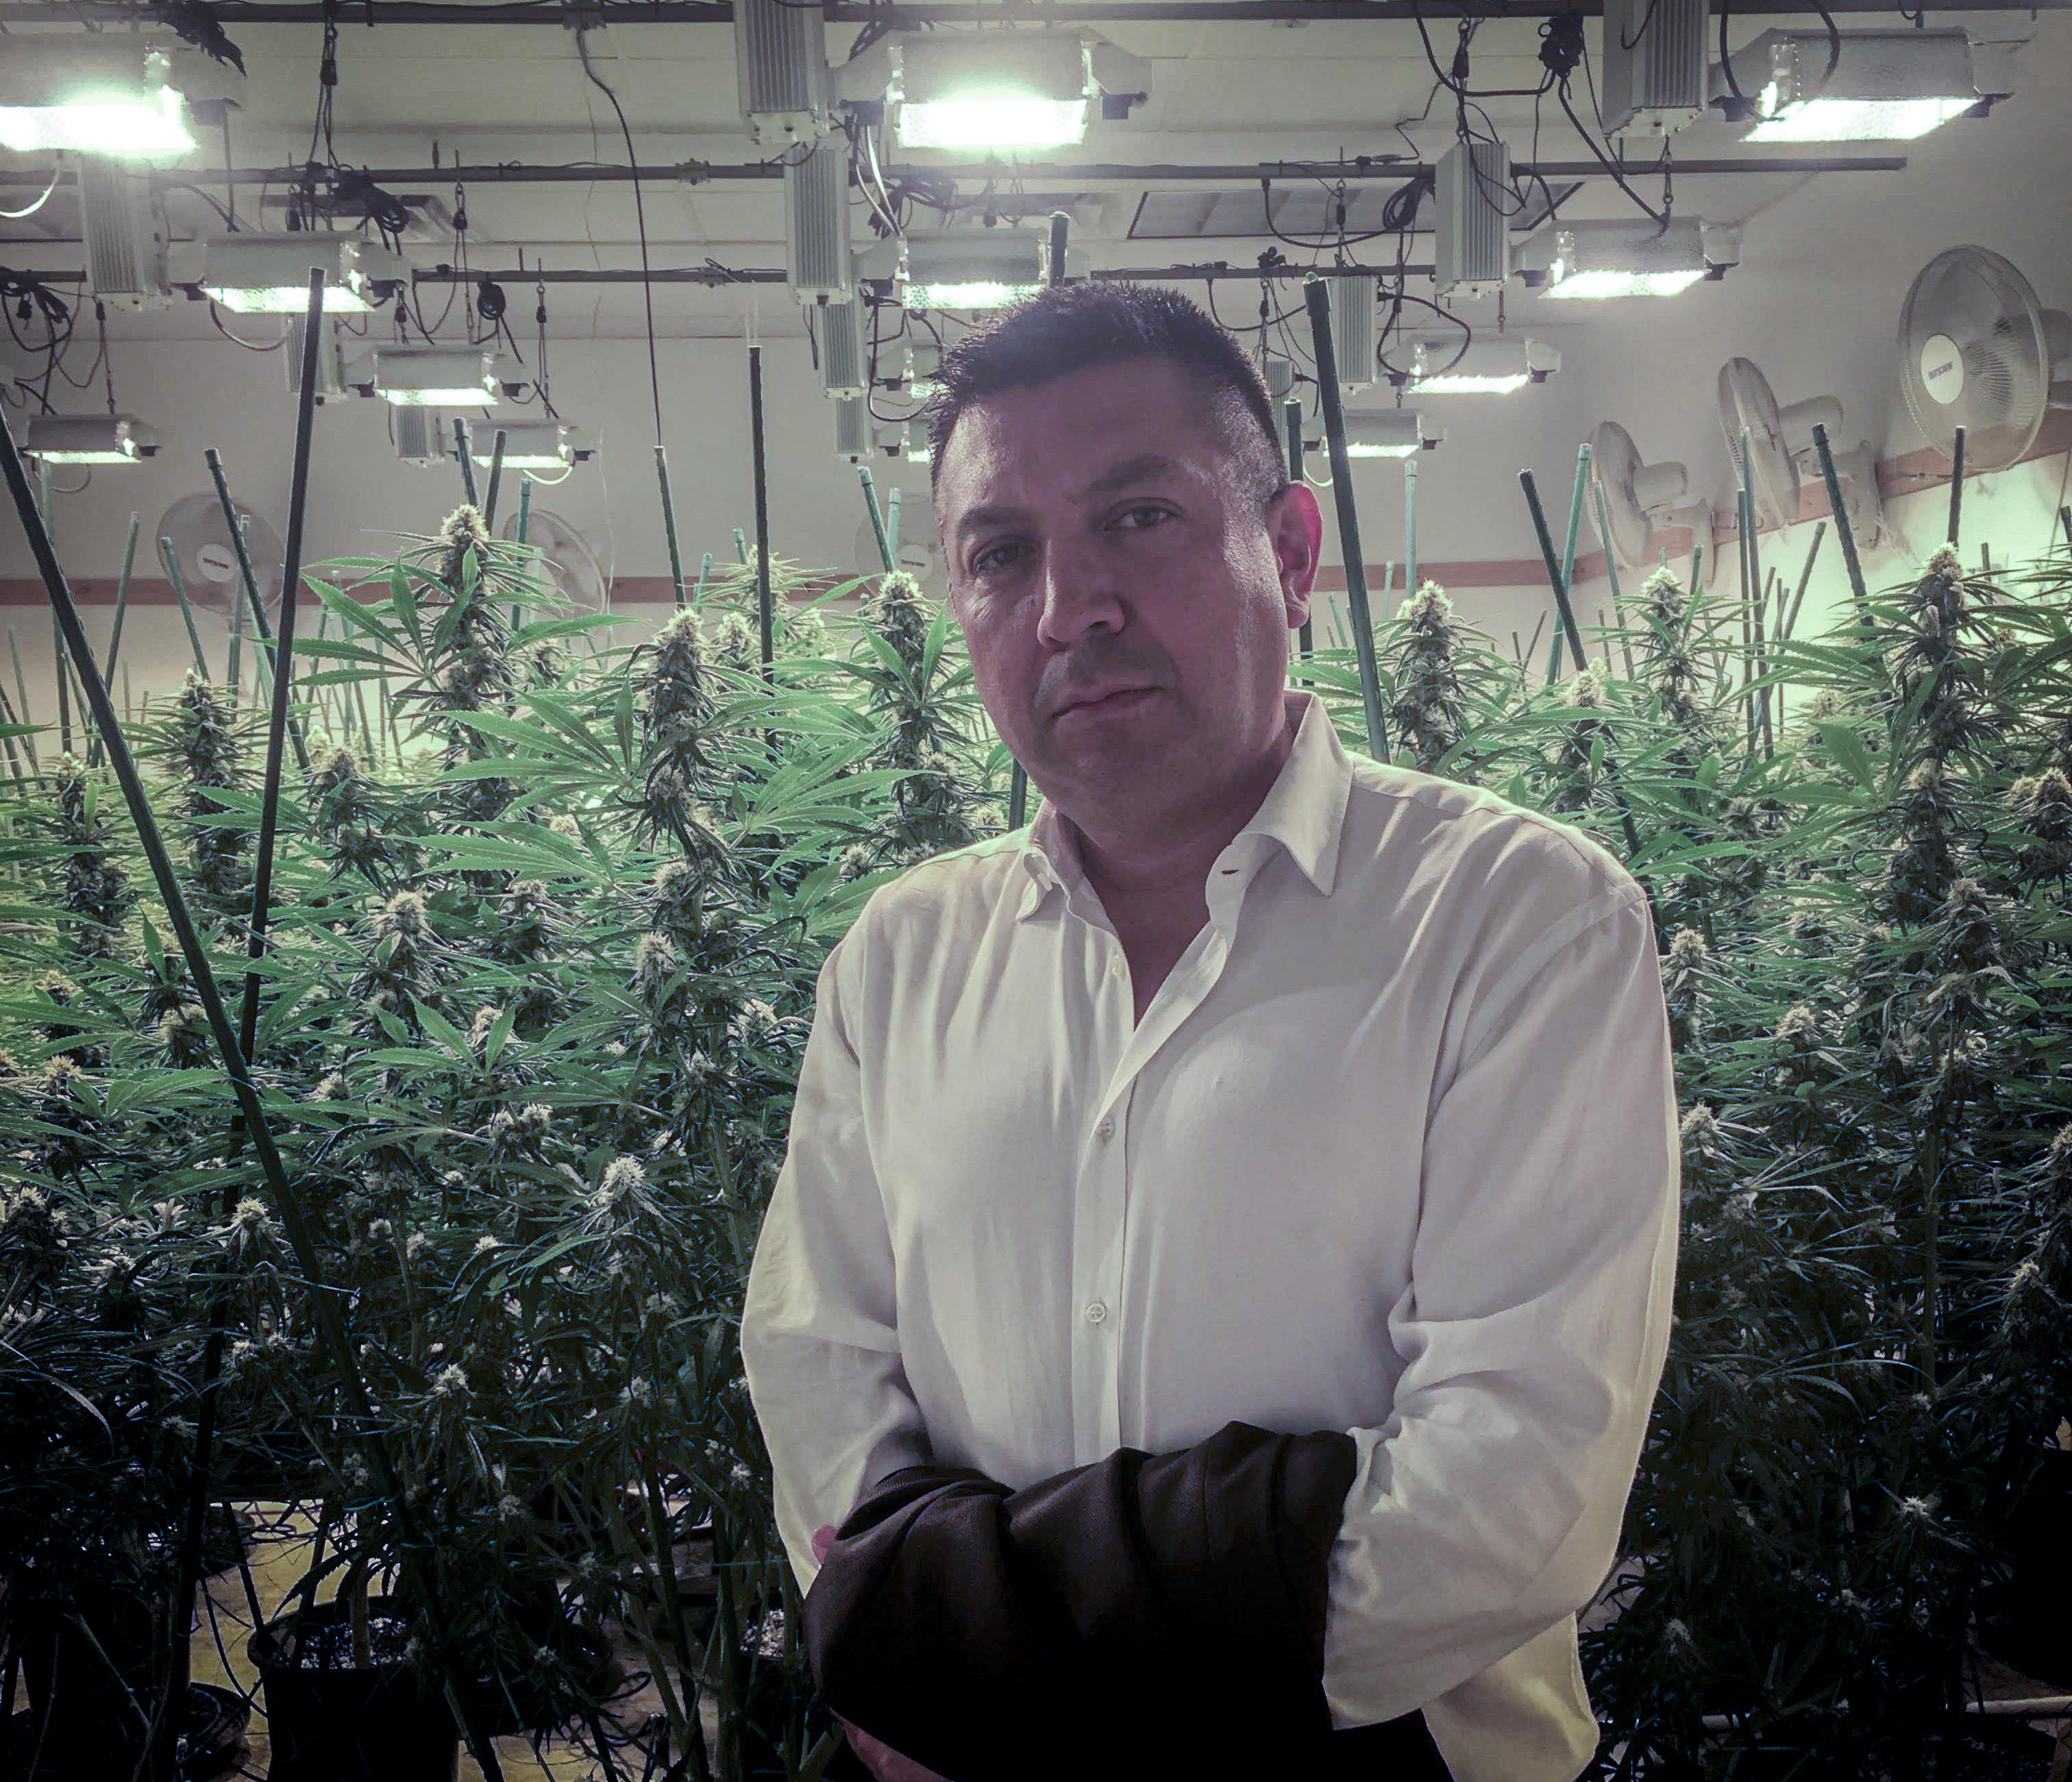 Demitri Downing at an indoor grow in Arizona.